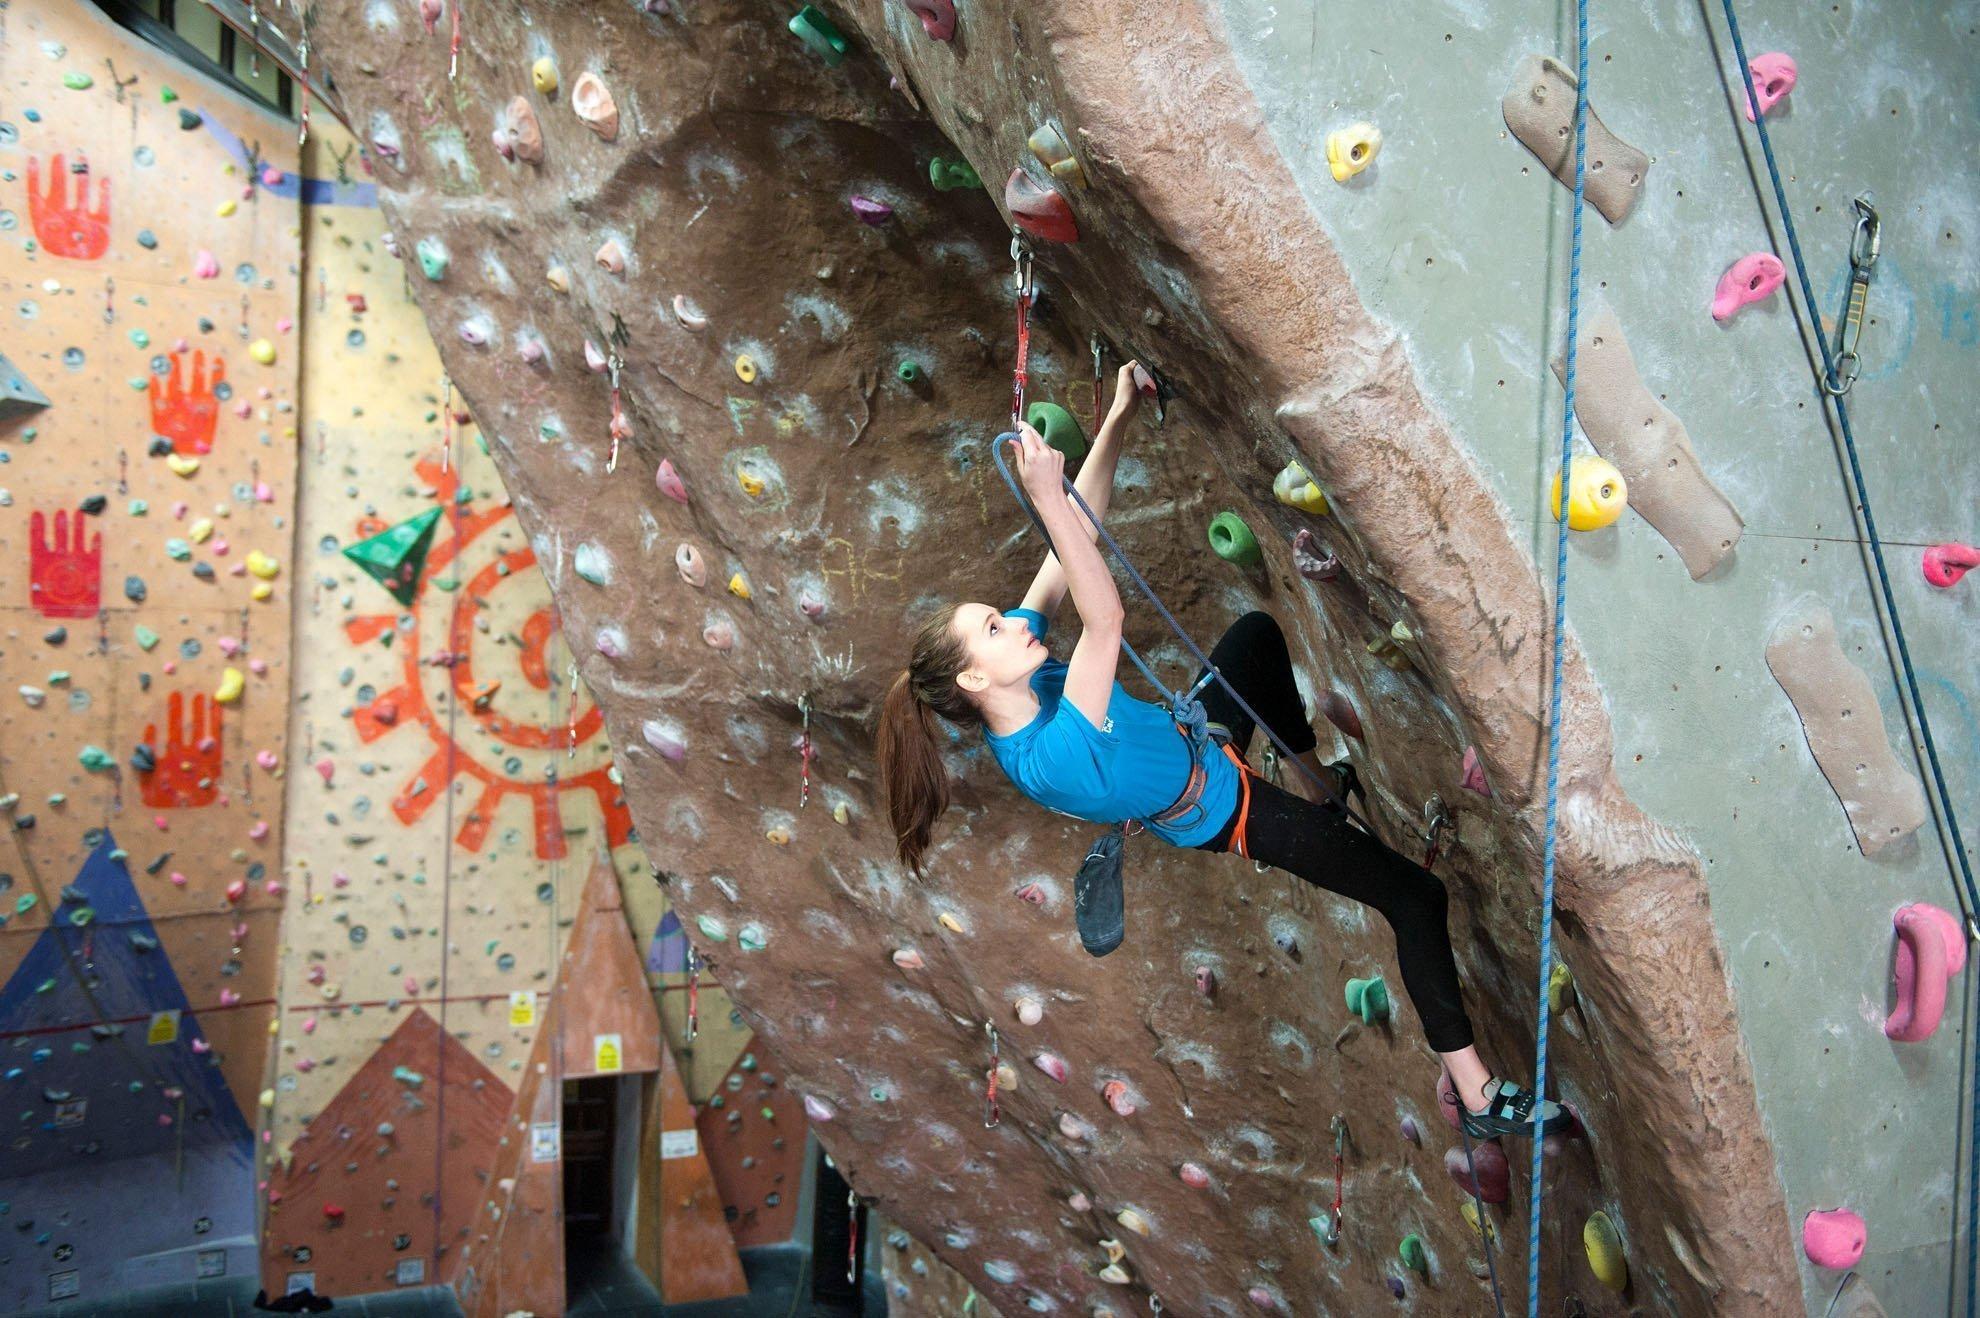 Glasgow Climbing Centre - event photography - promo shots